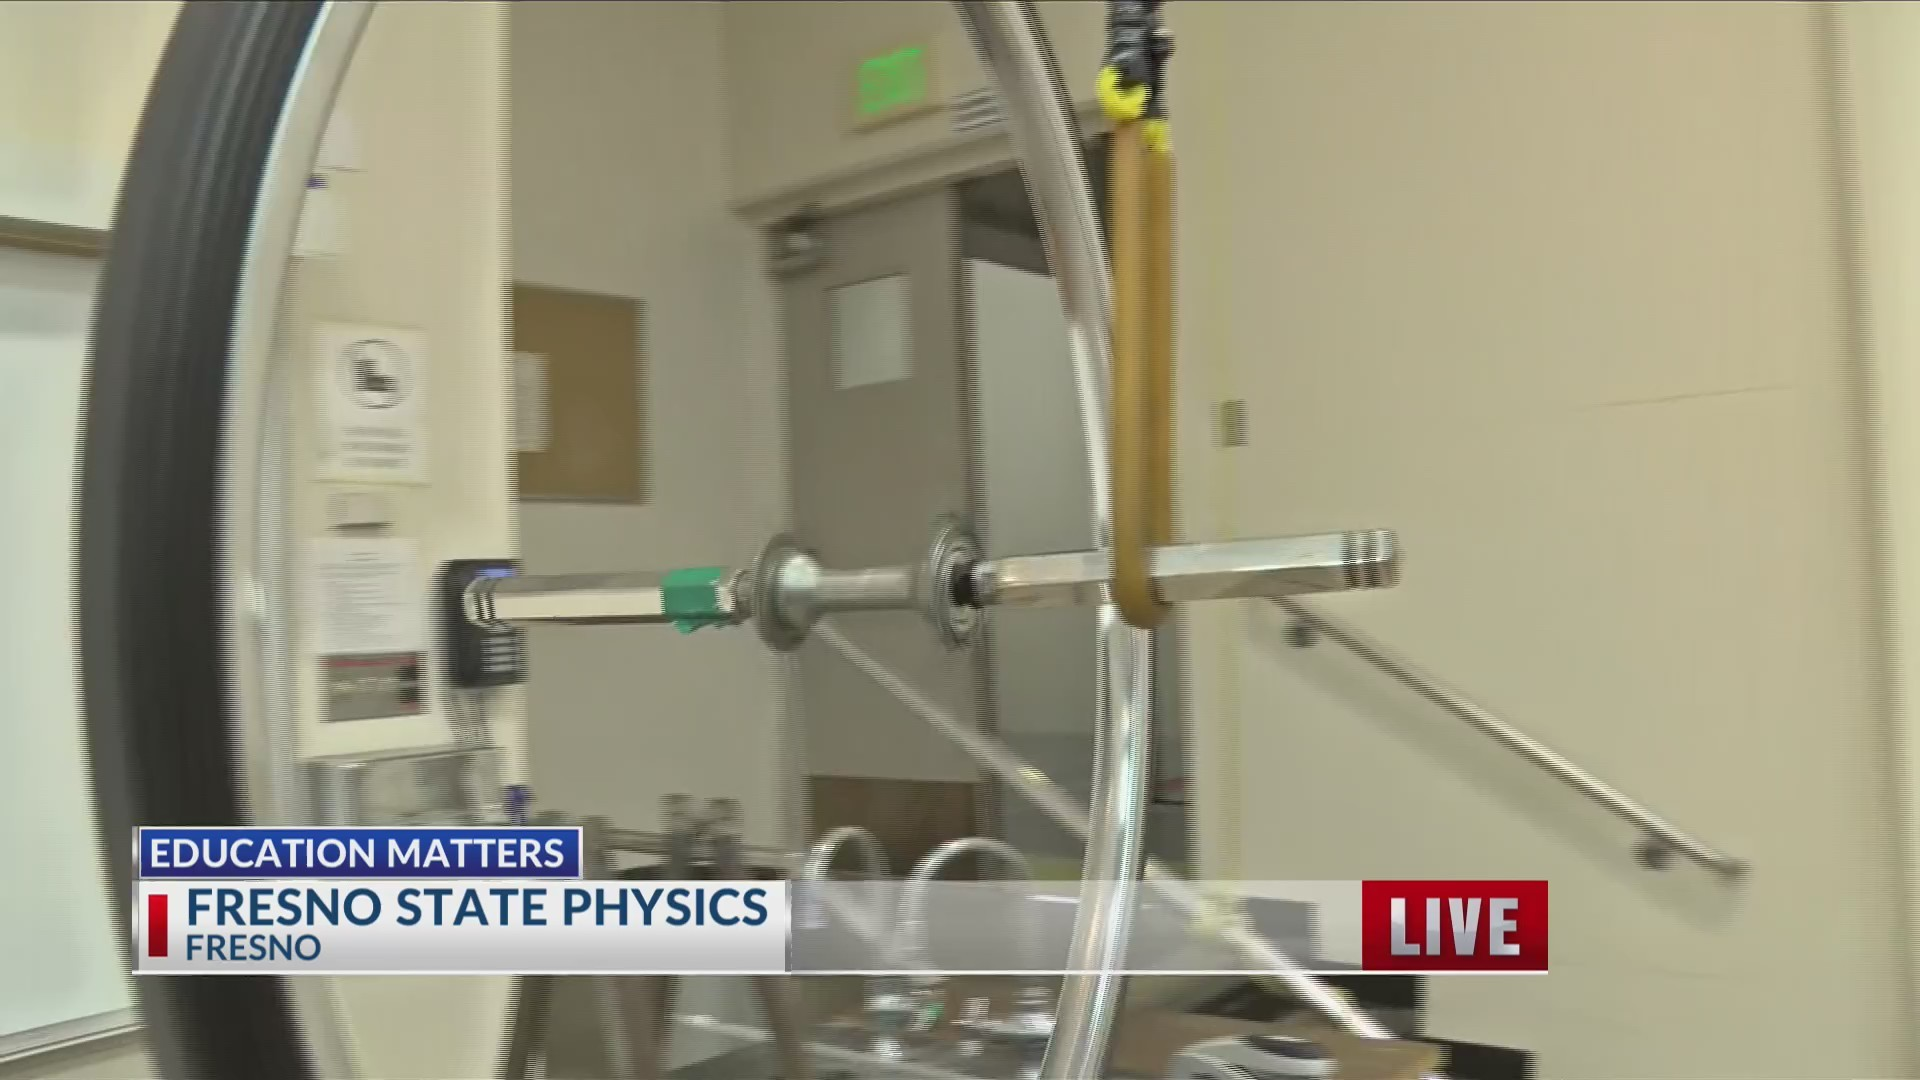 Fresno State Physics Outreach prepares impressive experiments